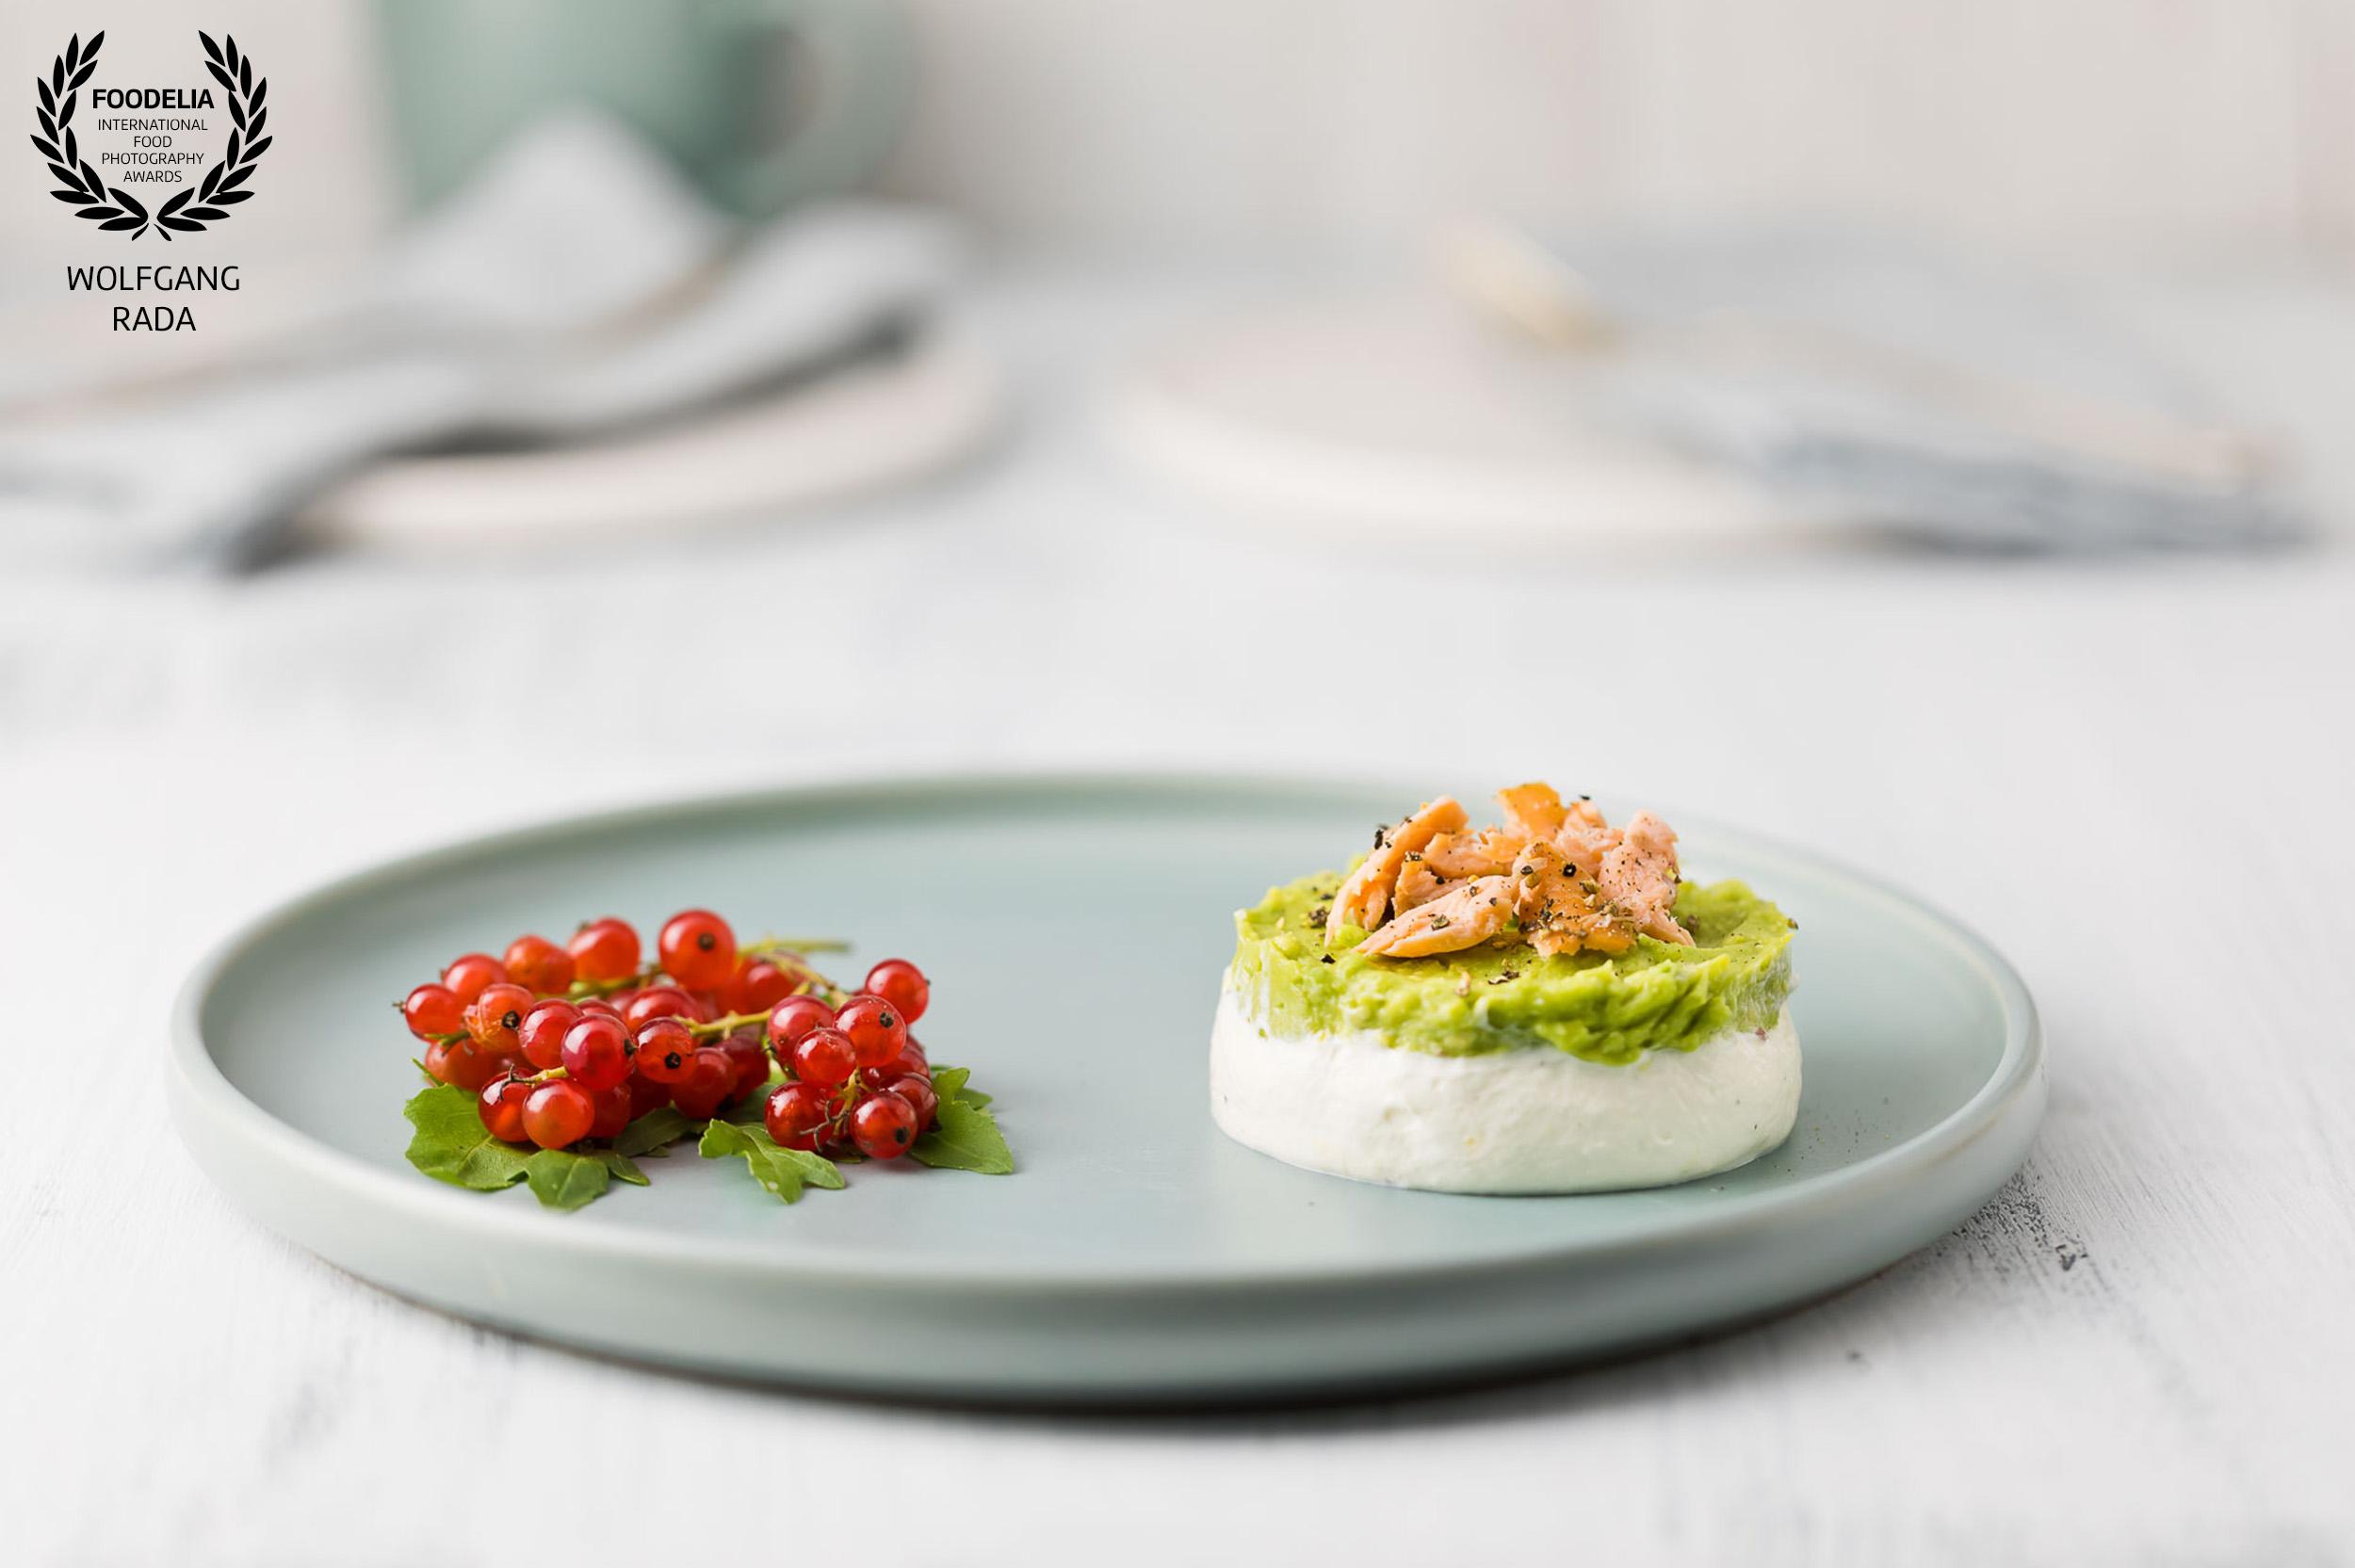 Joghurt Mousse mit Avocadocreme und geräuchertem Lachs Wolfgang Rada foodfotograf Foodelia Award für casual cooking